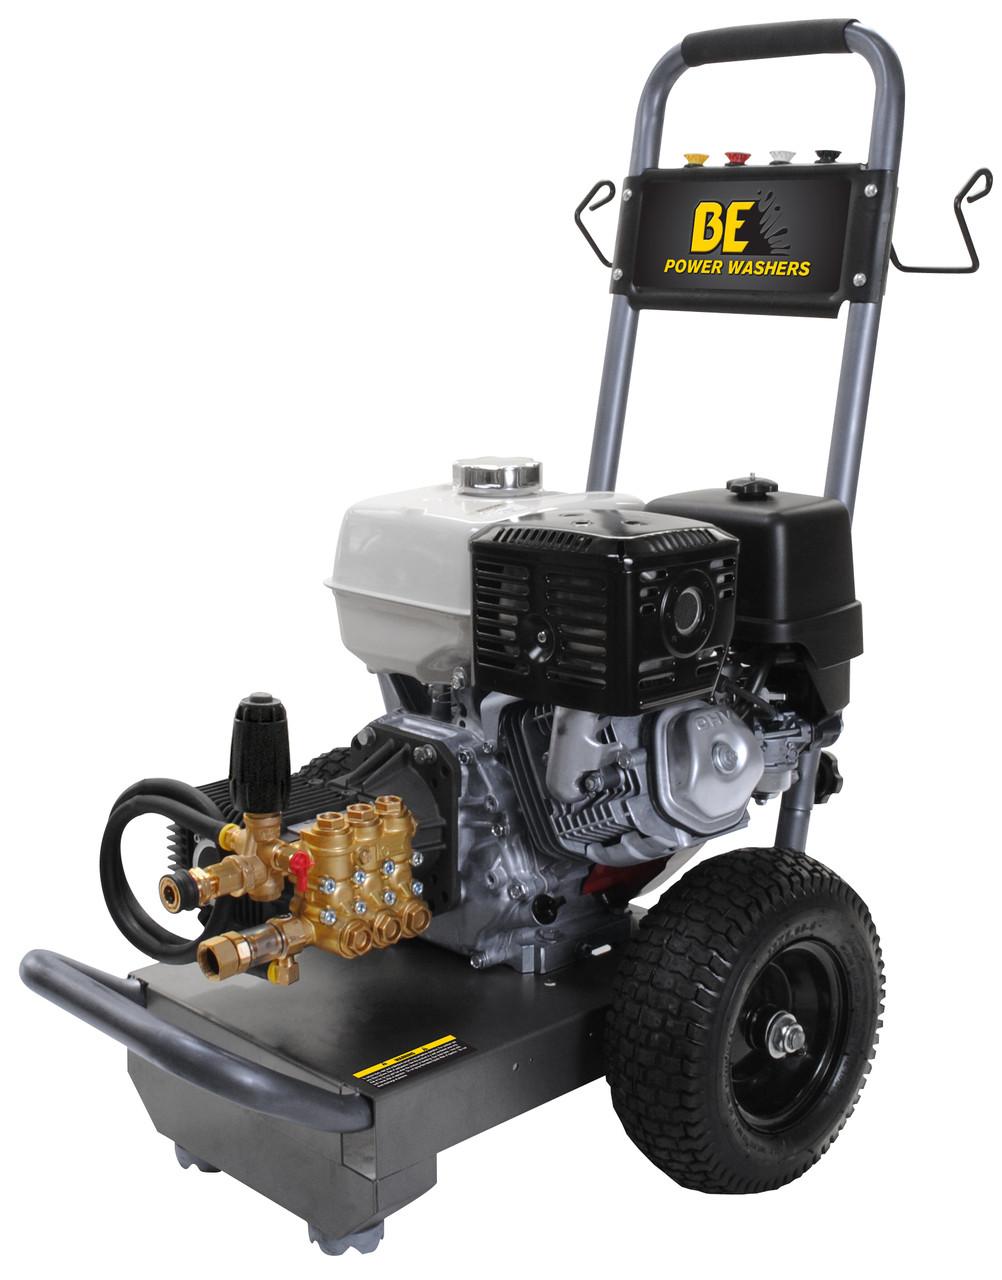 B4013 HCS Pressure Washer. 4000 PSI, 4 GPM Honda Engine And Comet Pump.